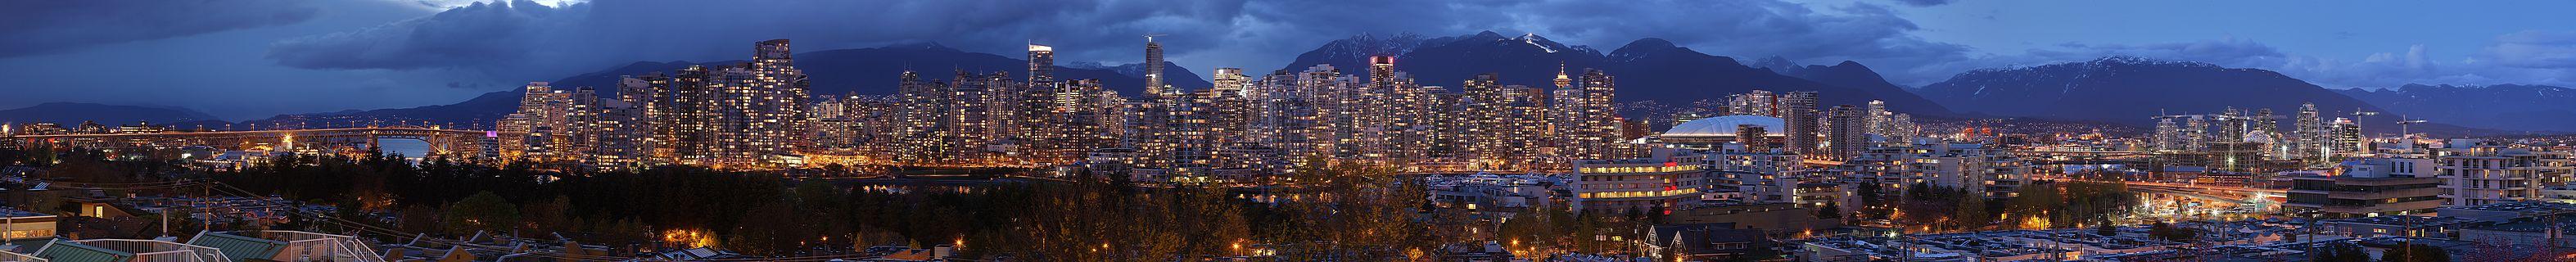 http://upload.wikimedia.org/wikipedia/commons/thumb/2/27/Vancouver_dusk_pano.jpg/3146px-Vancouver_dusk_pano.jpg